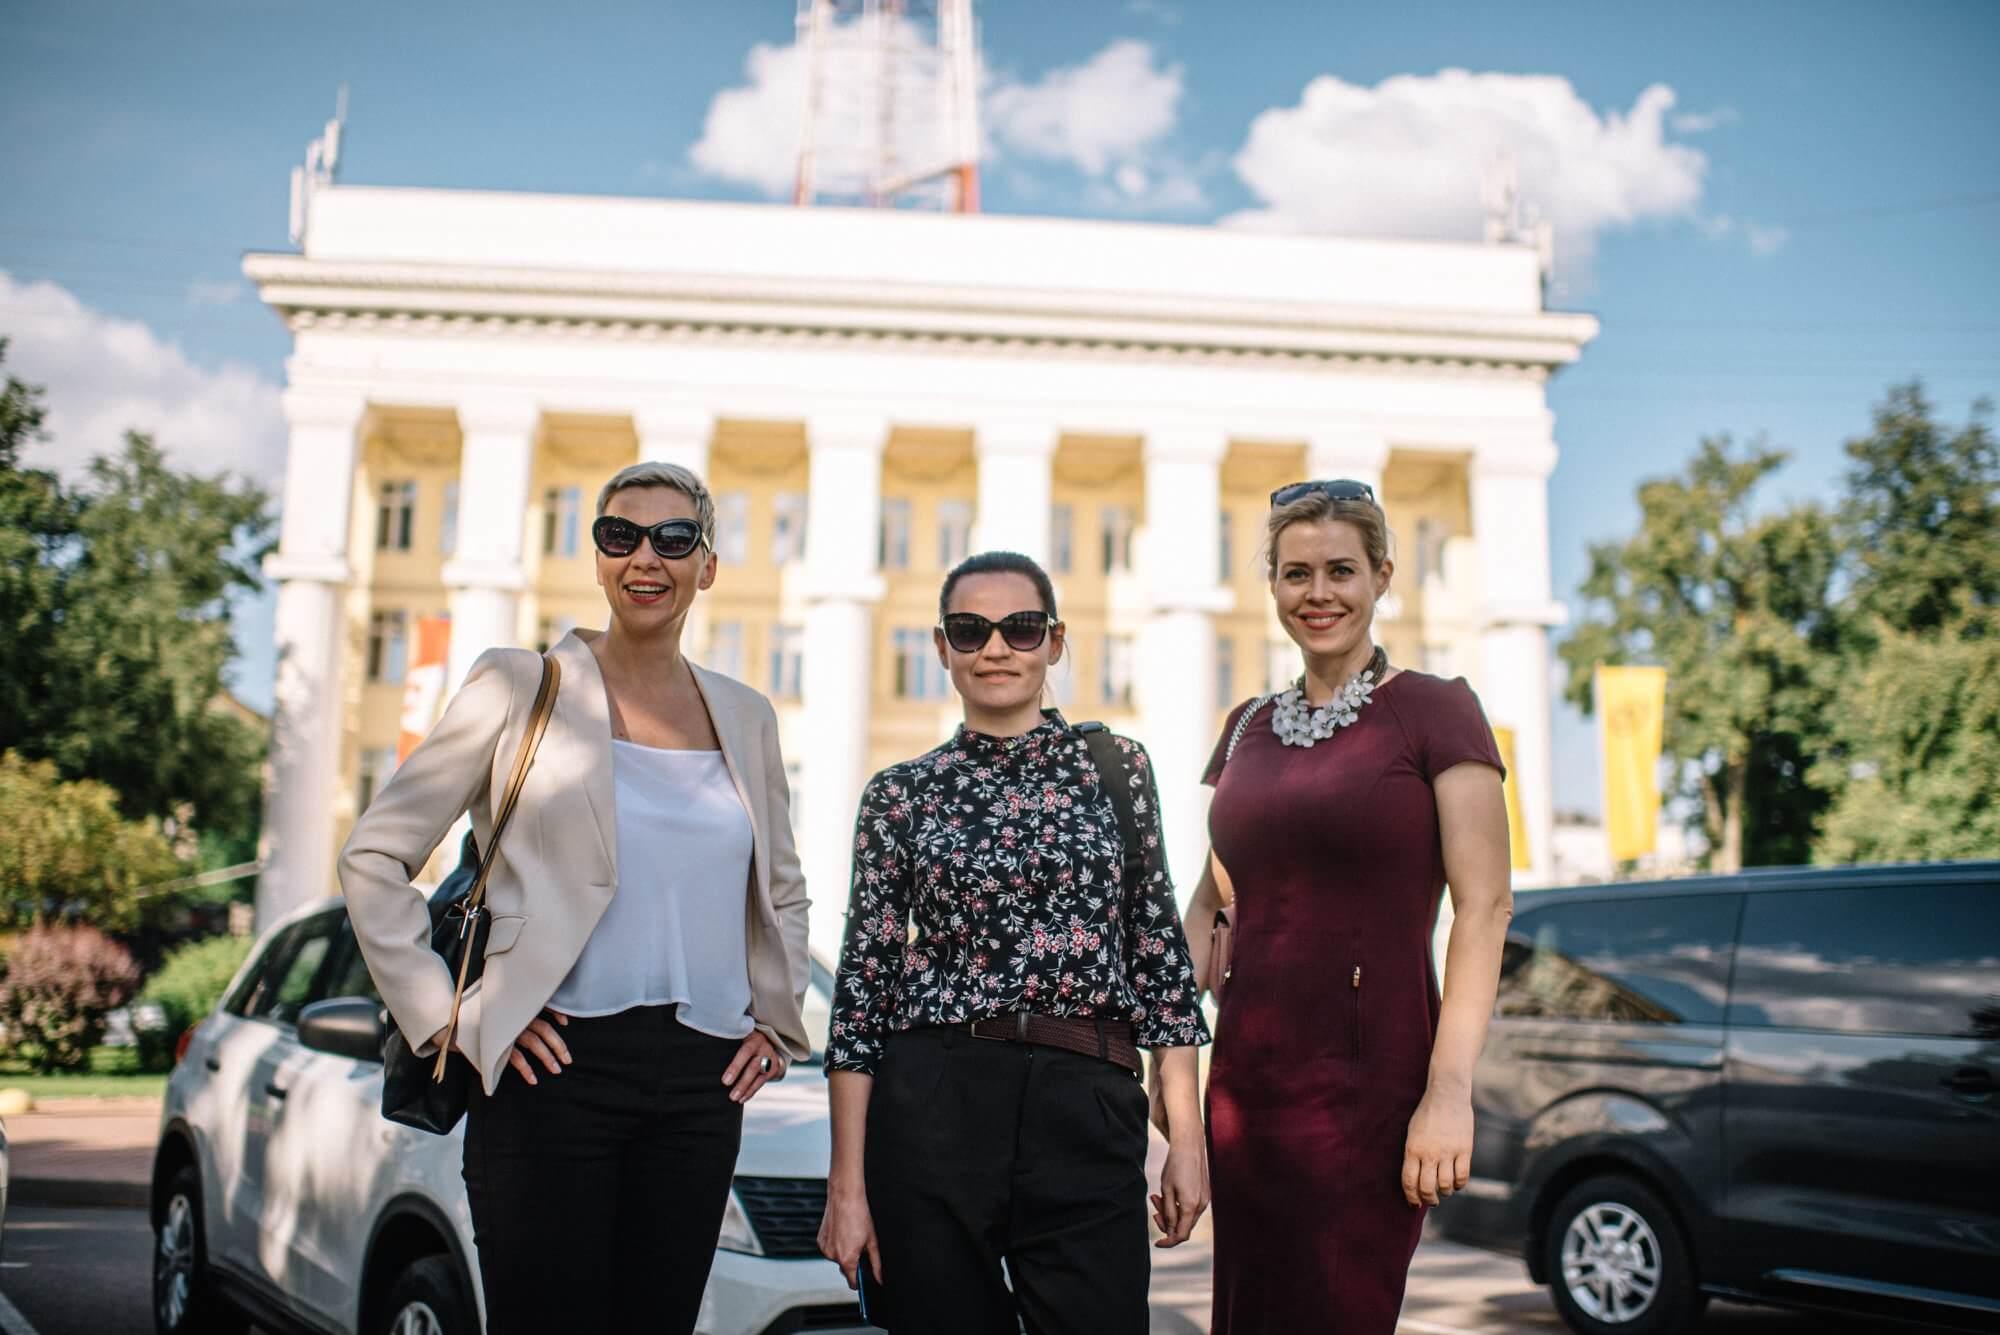 Tikhanovskaya, Kolesnikova and Tsepkalo nominated for the Nobel Peace Prize 2021